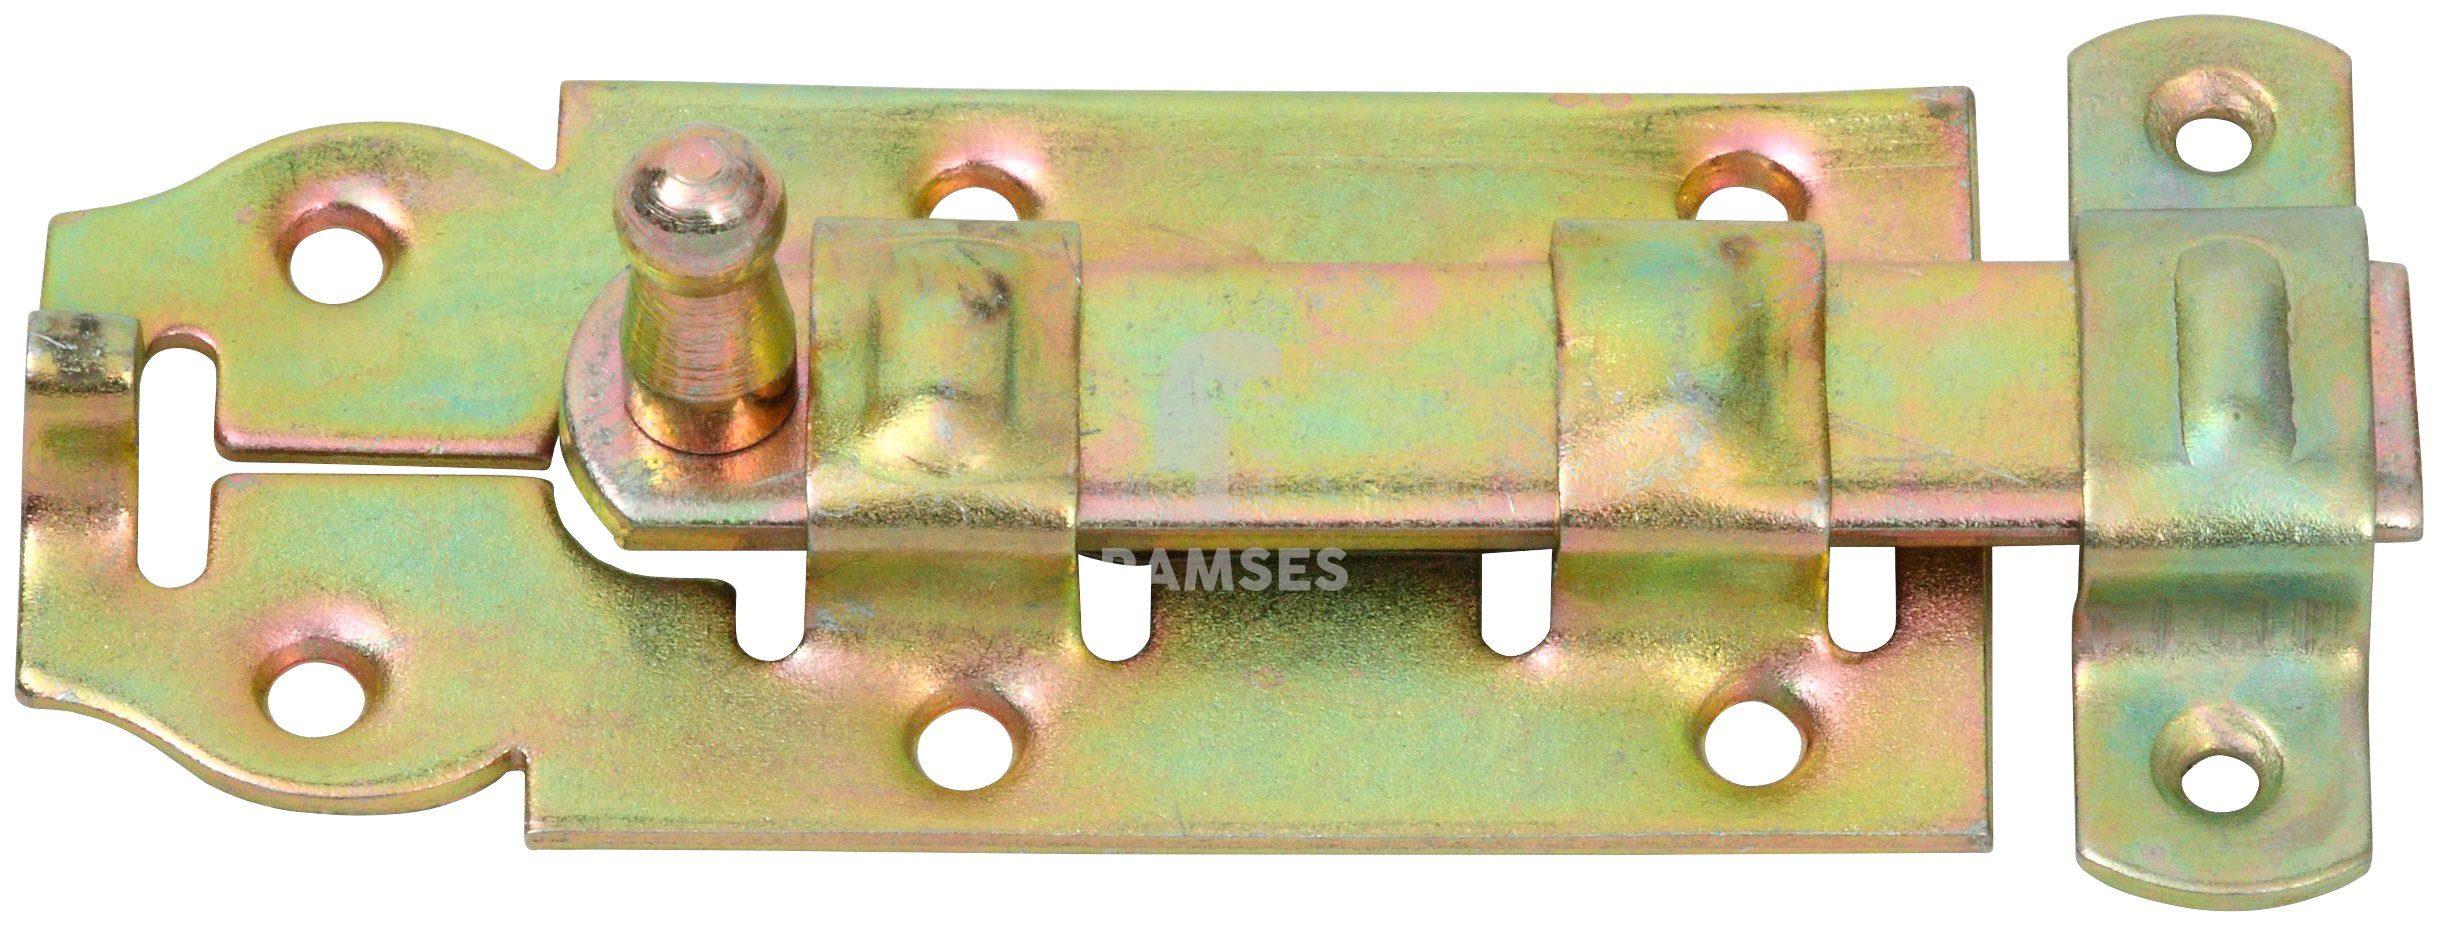 RAMSES Türriegel , gerade 140x55 mm Stahl verzinkt